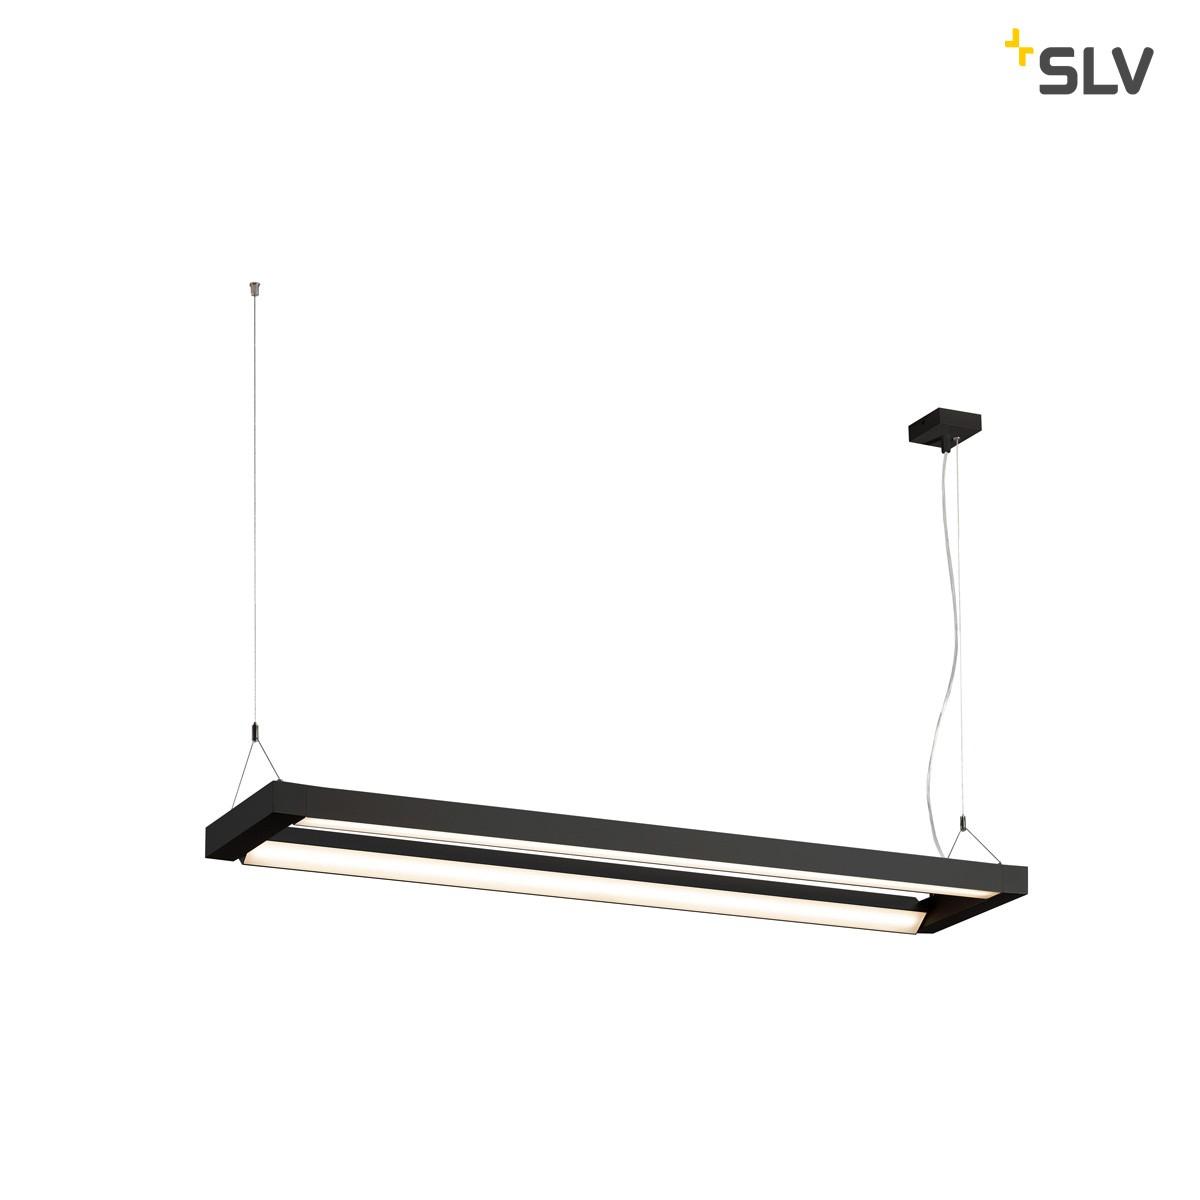 SLV Long Grill Pendelleuchte, schwarz